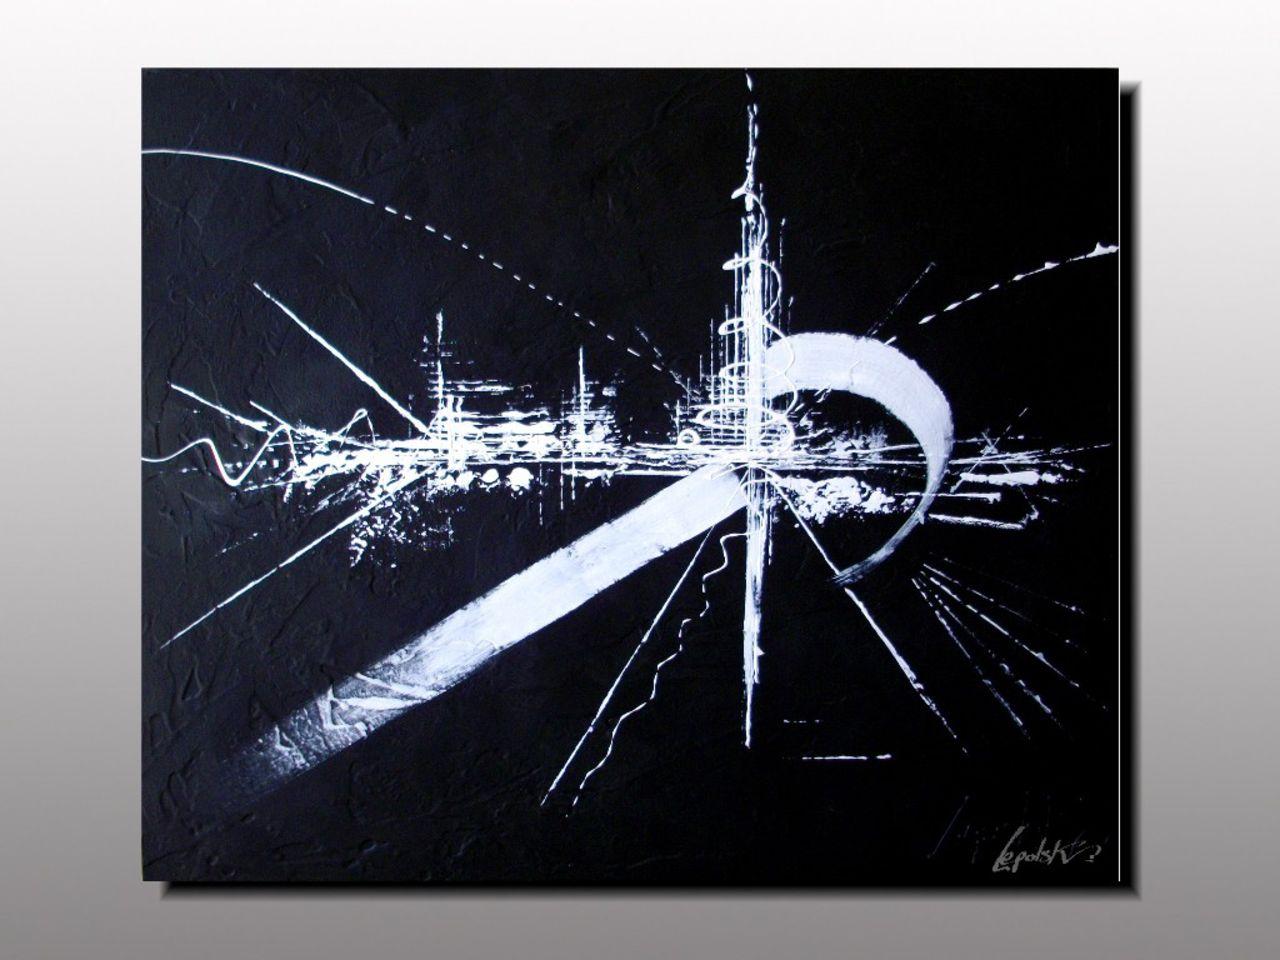 MK  Lepolsk Matuszewski ARCHETYPE   Dripping Art abstrait